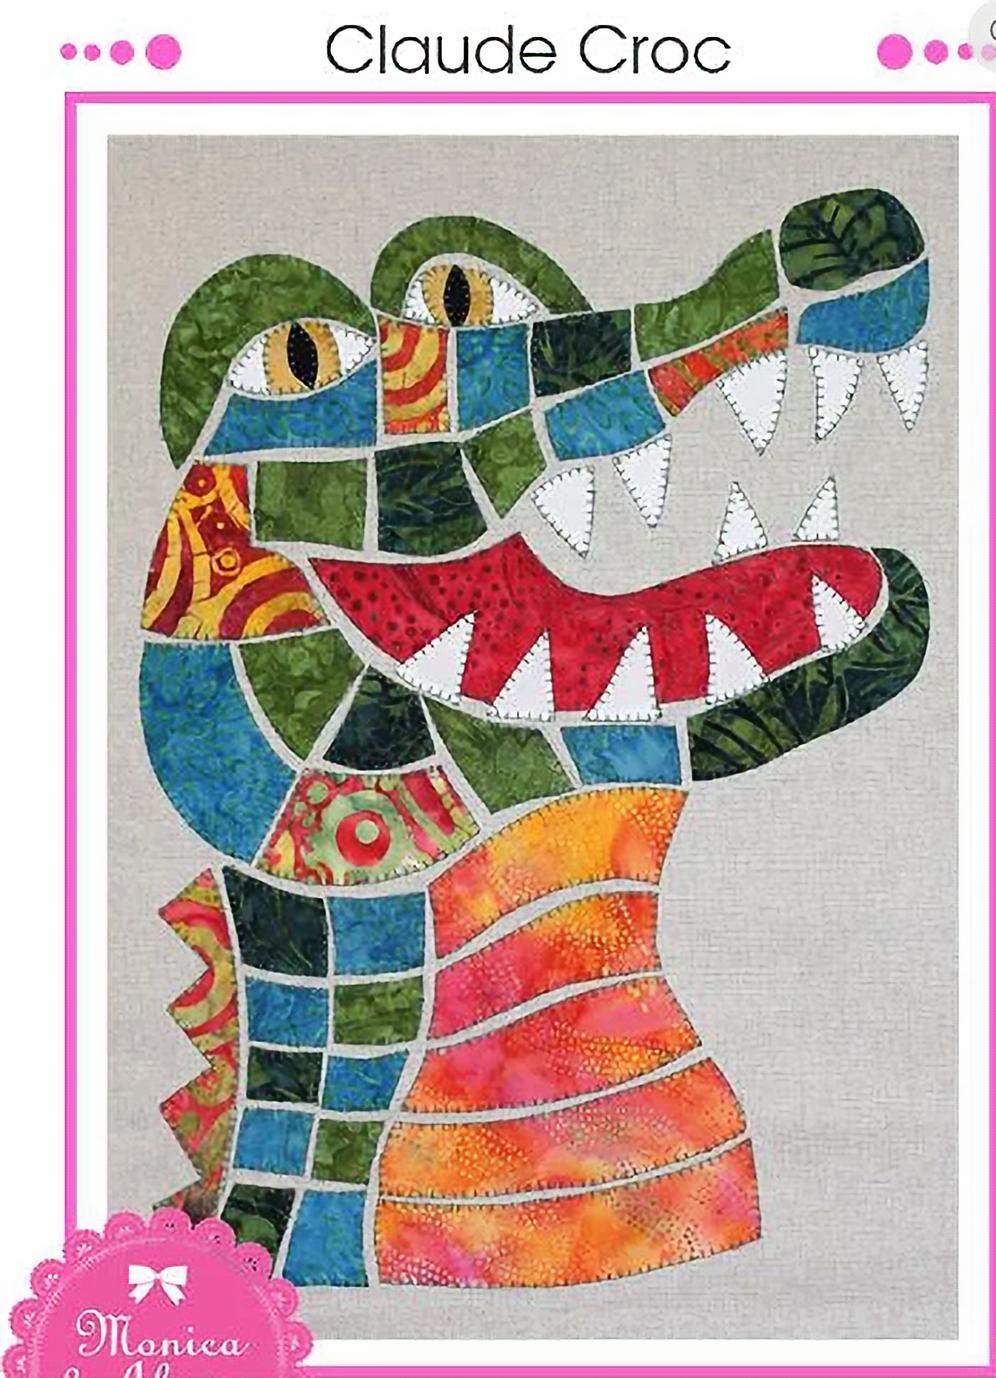 Monica Poole Pattern Claude Croc